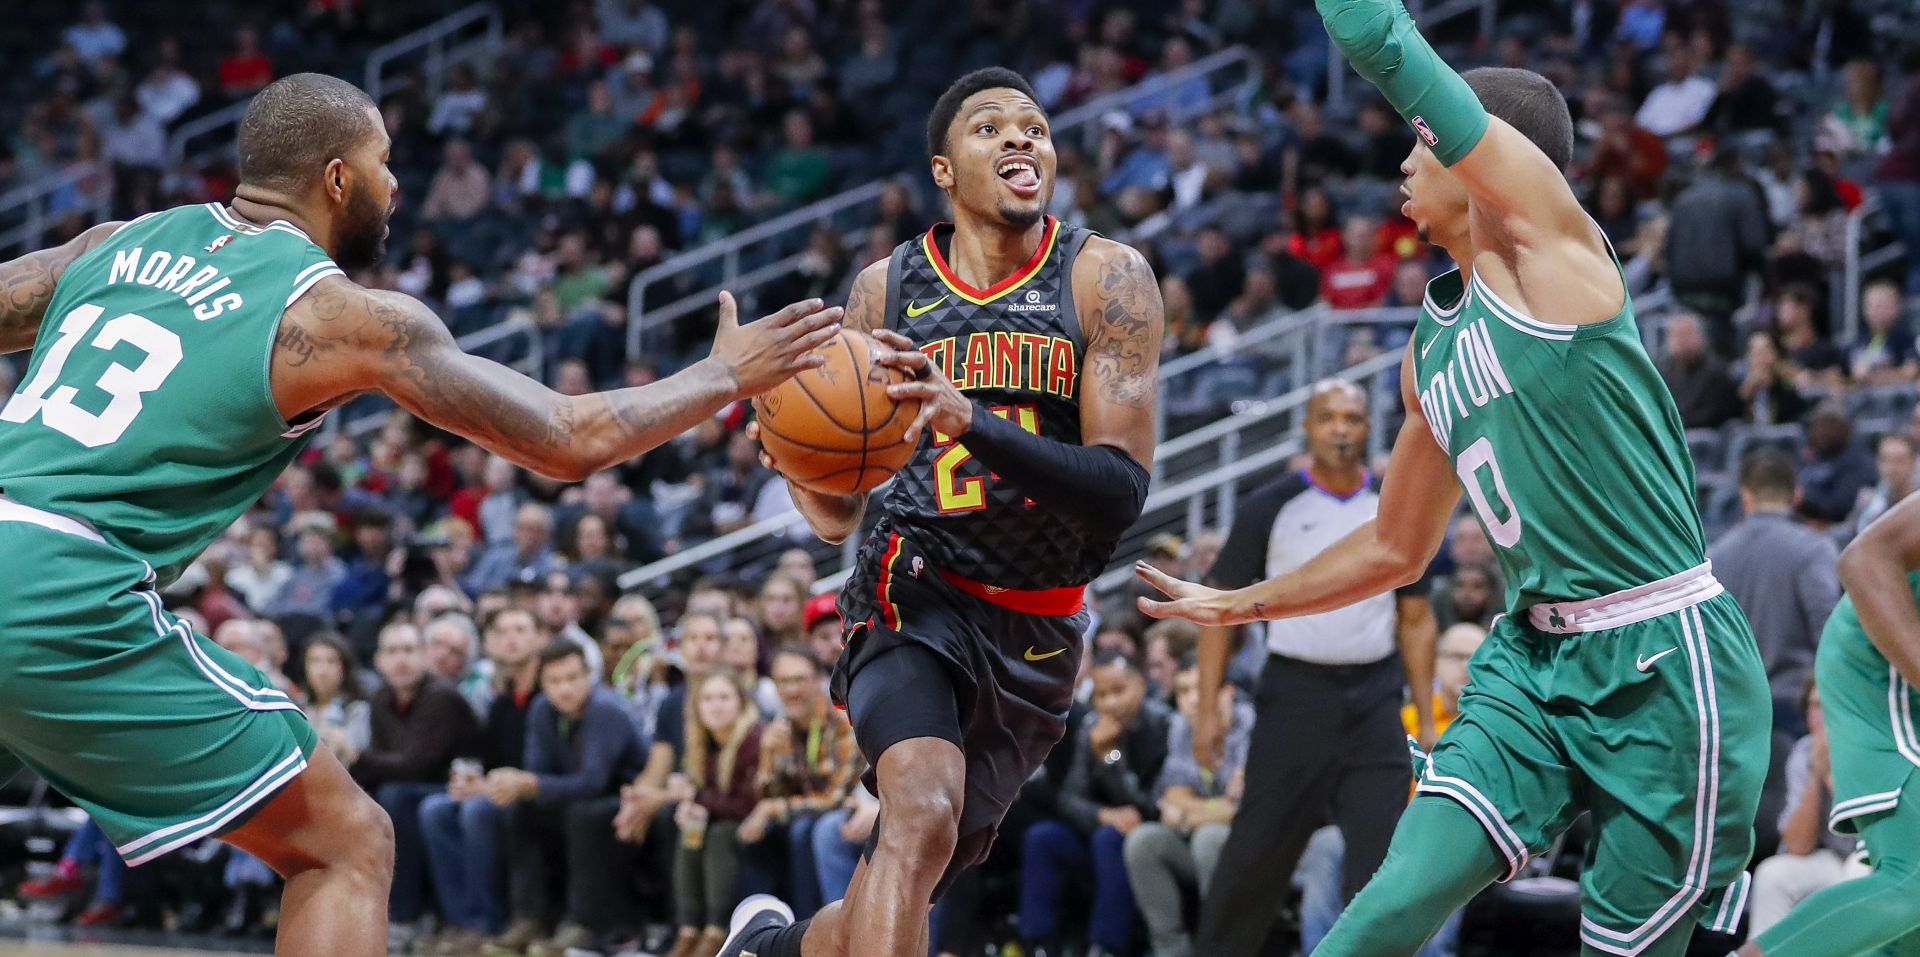 NBA Philadelphia prokockala 22 koša prednosti, Šarić postigao 13 koševa i 10 skokova